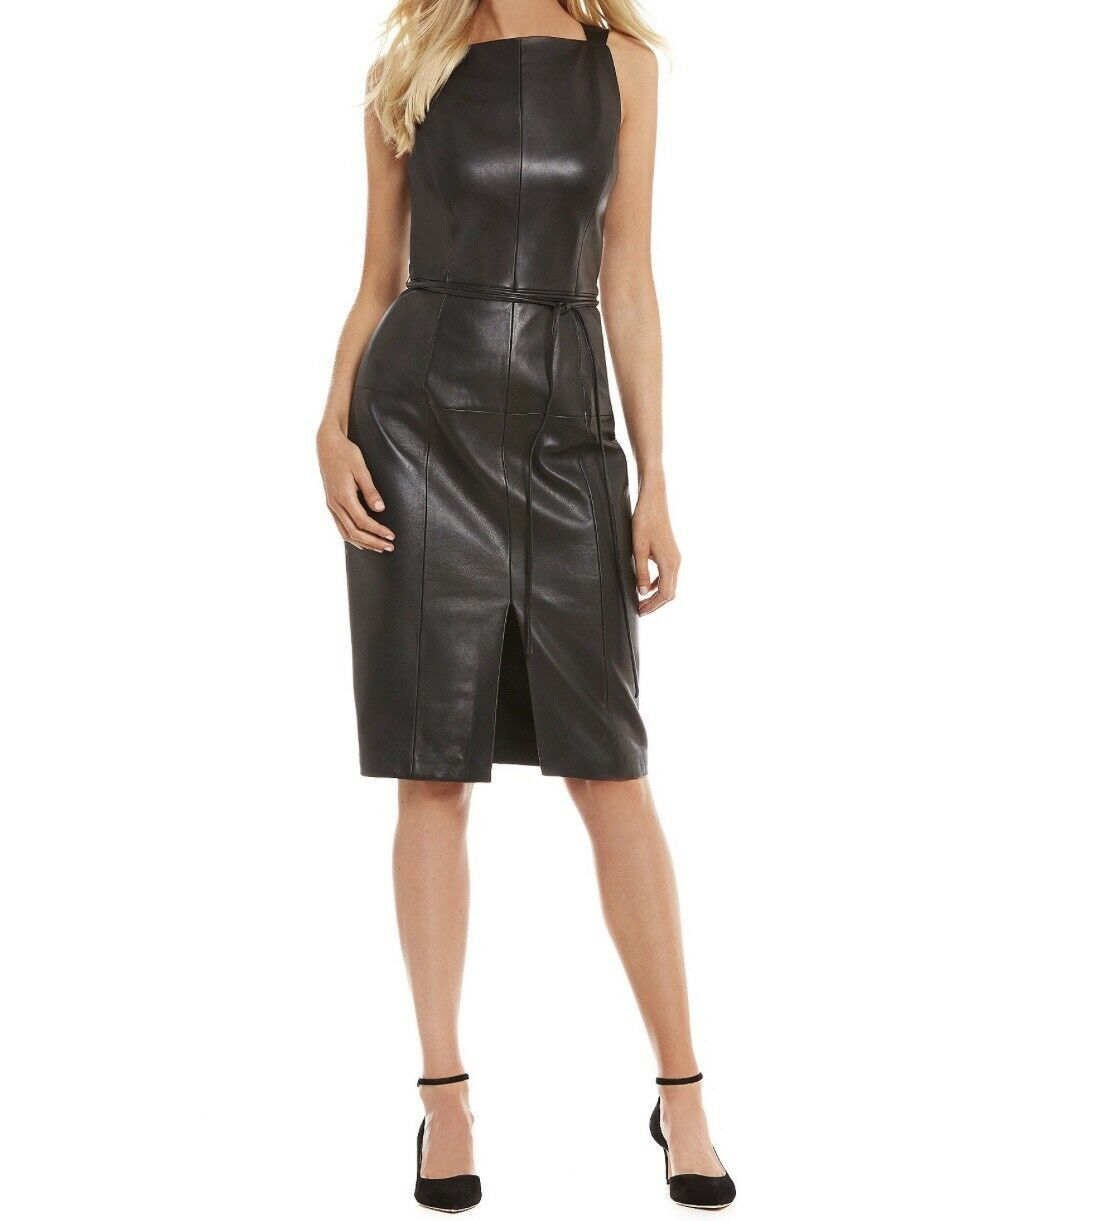 Antonio Melani Luxury Luxury Luxury Collection Koko Front Slit Genuine Leather Dress Size 6 619c3f